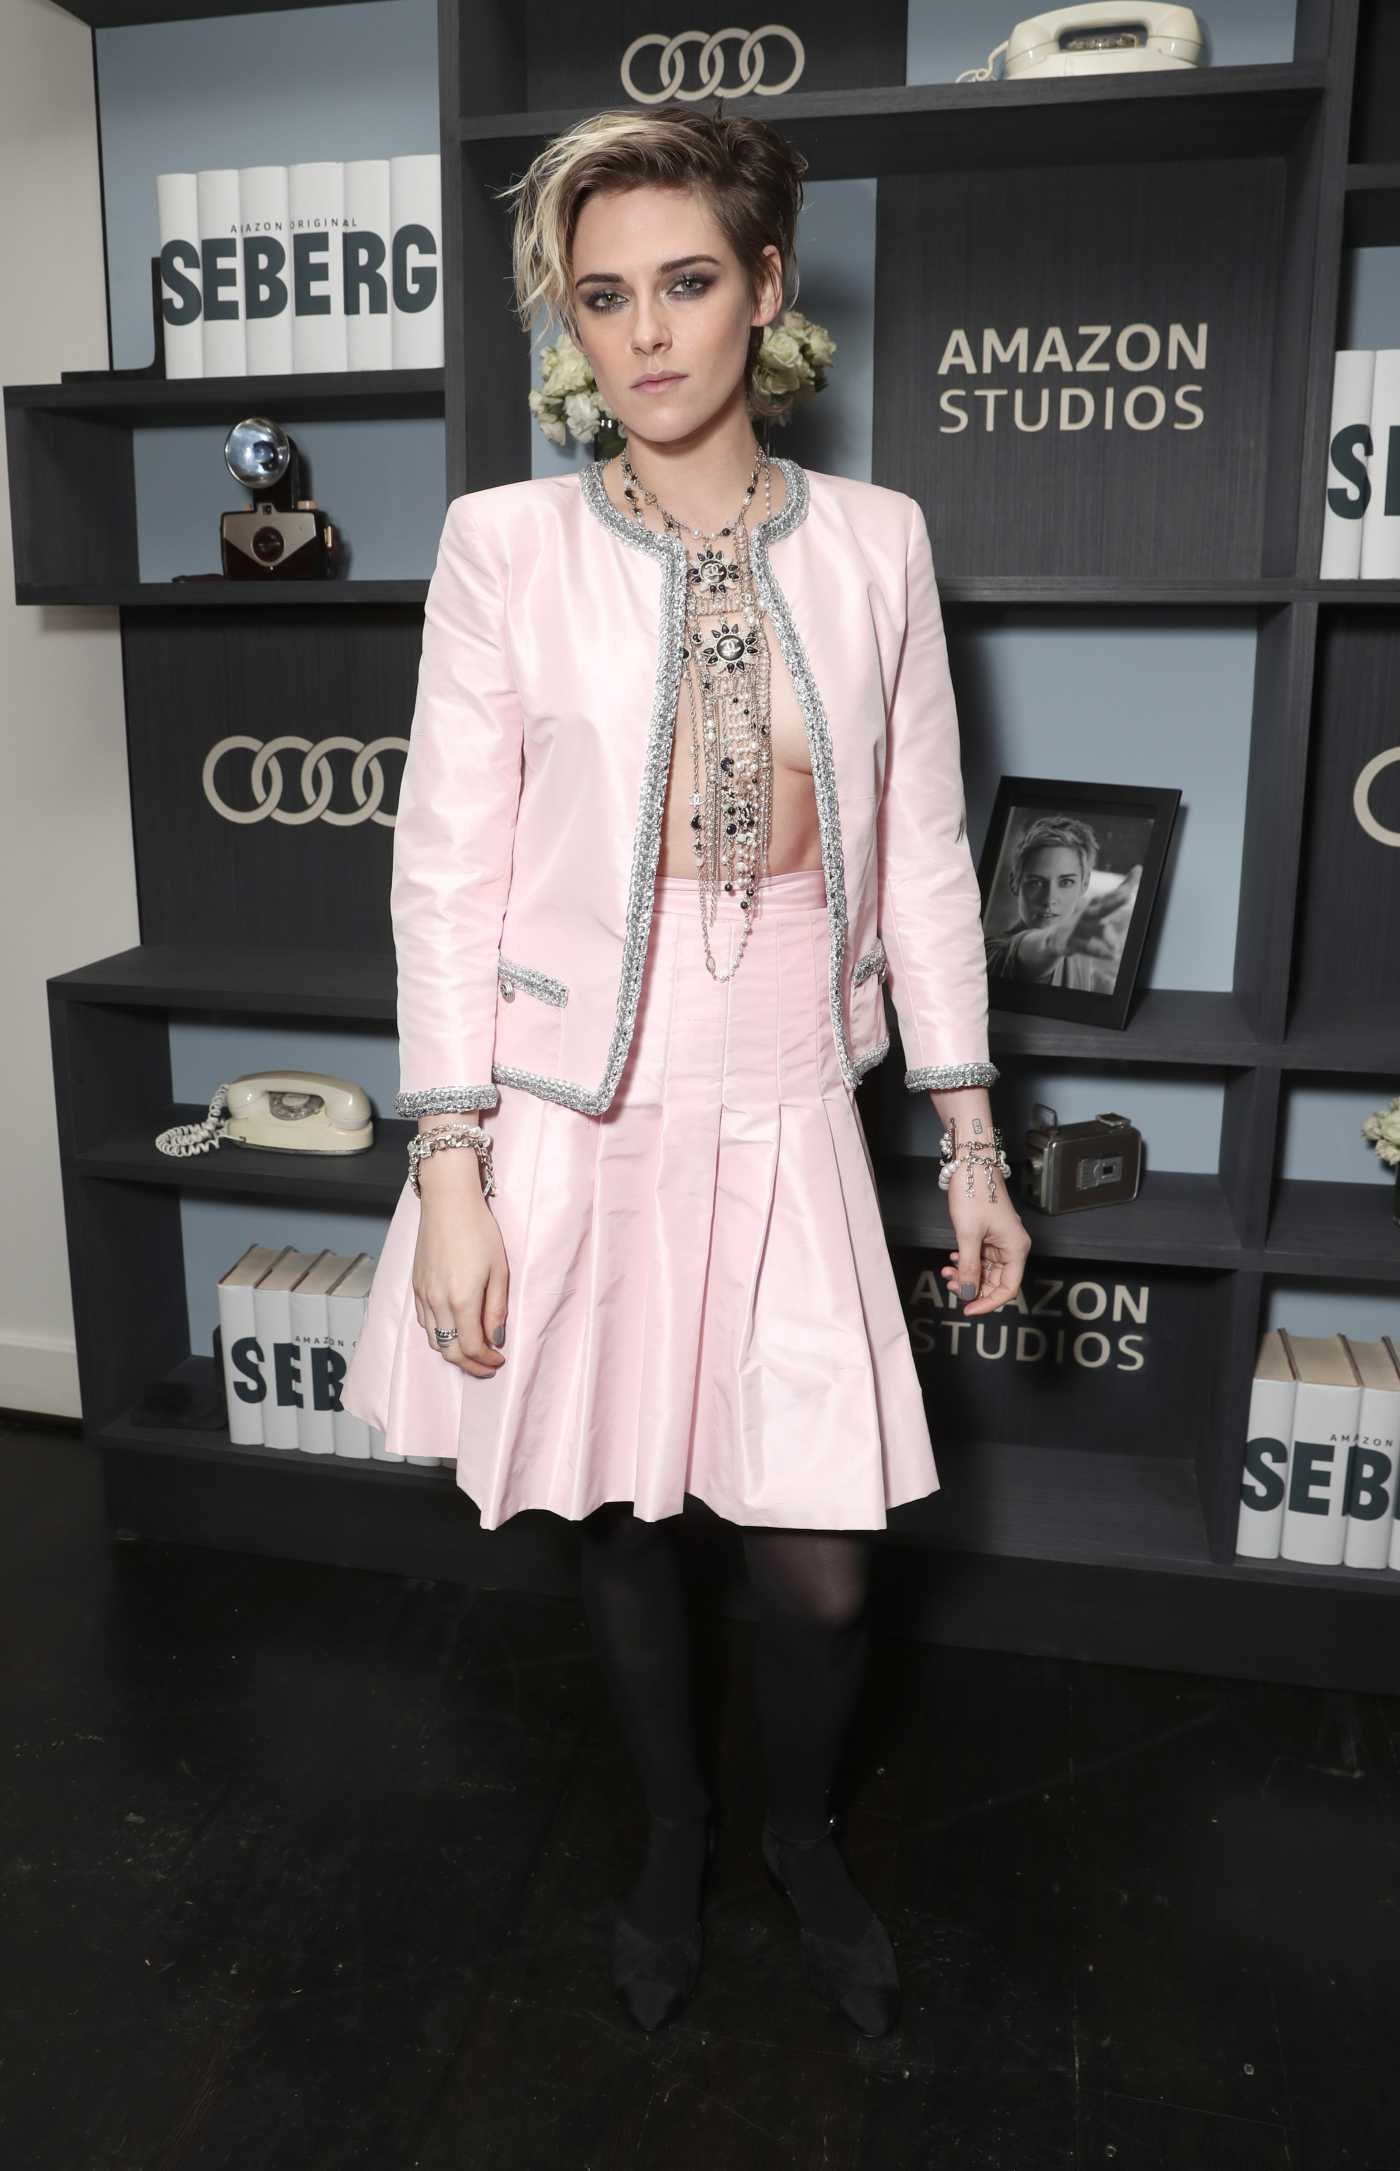 Kristen Stewart Attends Amazon Studios Seberg'Special Screening in Los Angeles 12/10/2019